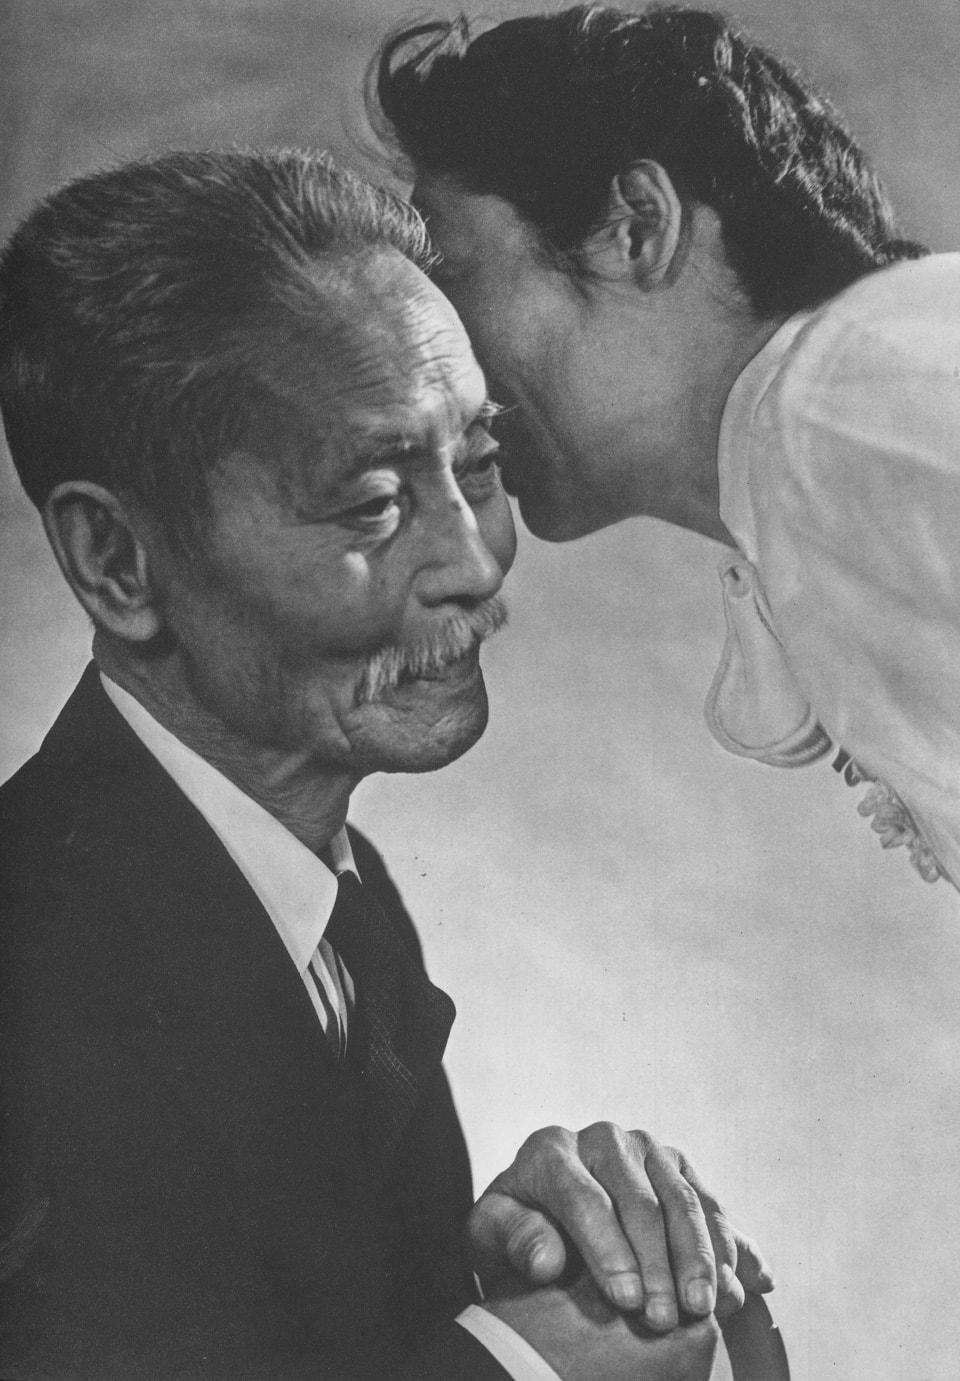 Yukio Ozaki by Yousuf Karsh, 1950